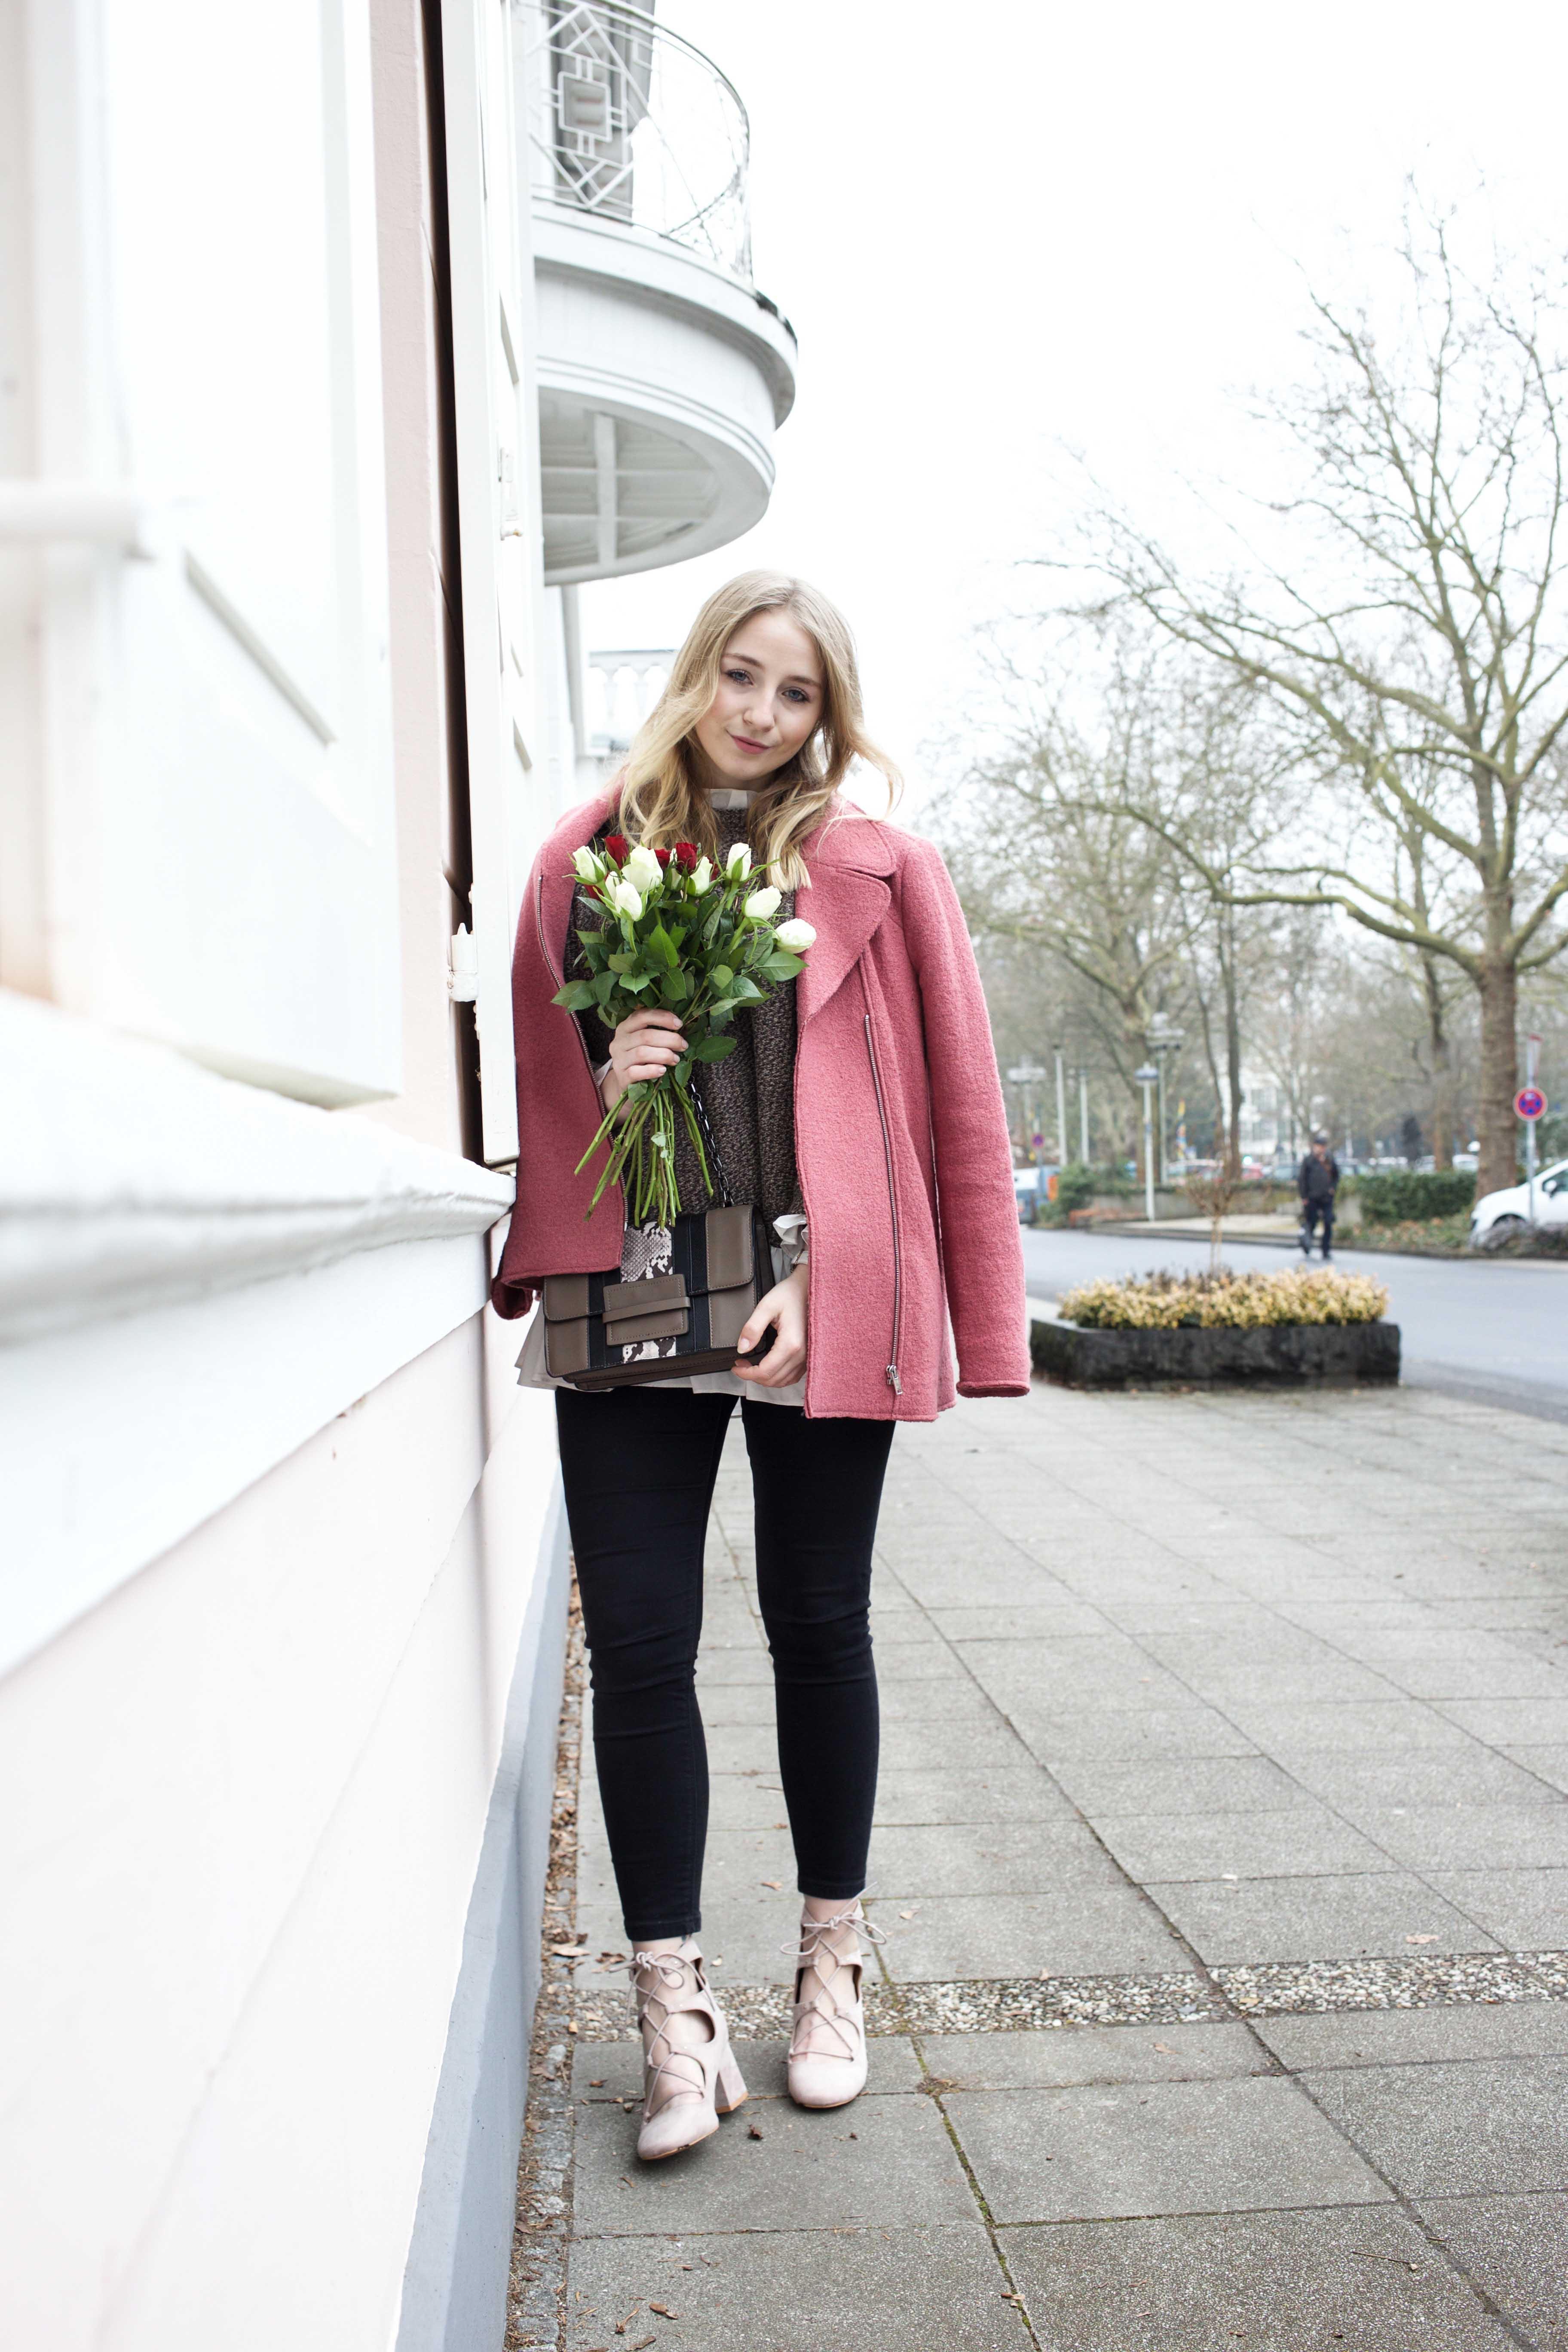 be-my-valentine-romantisches-valentinstags-outfit-valentinstag-inspiration-fashionblog-12345